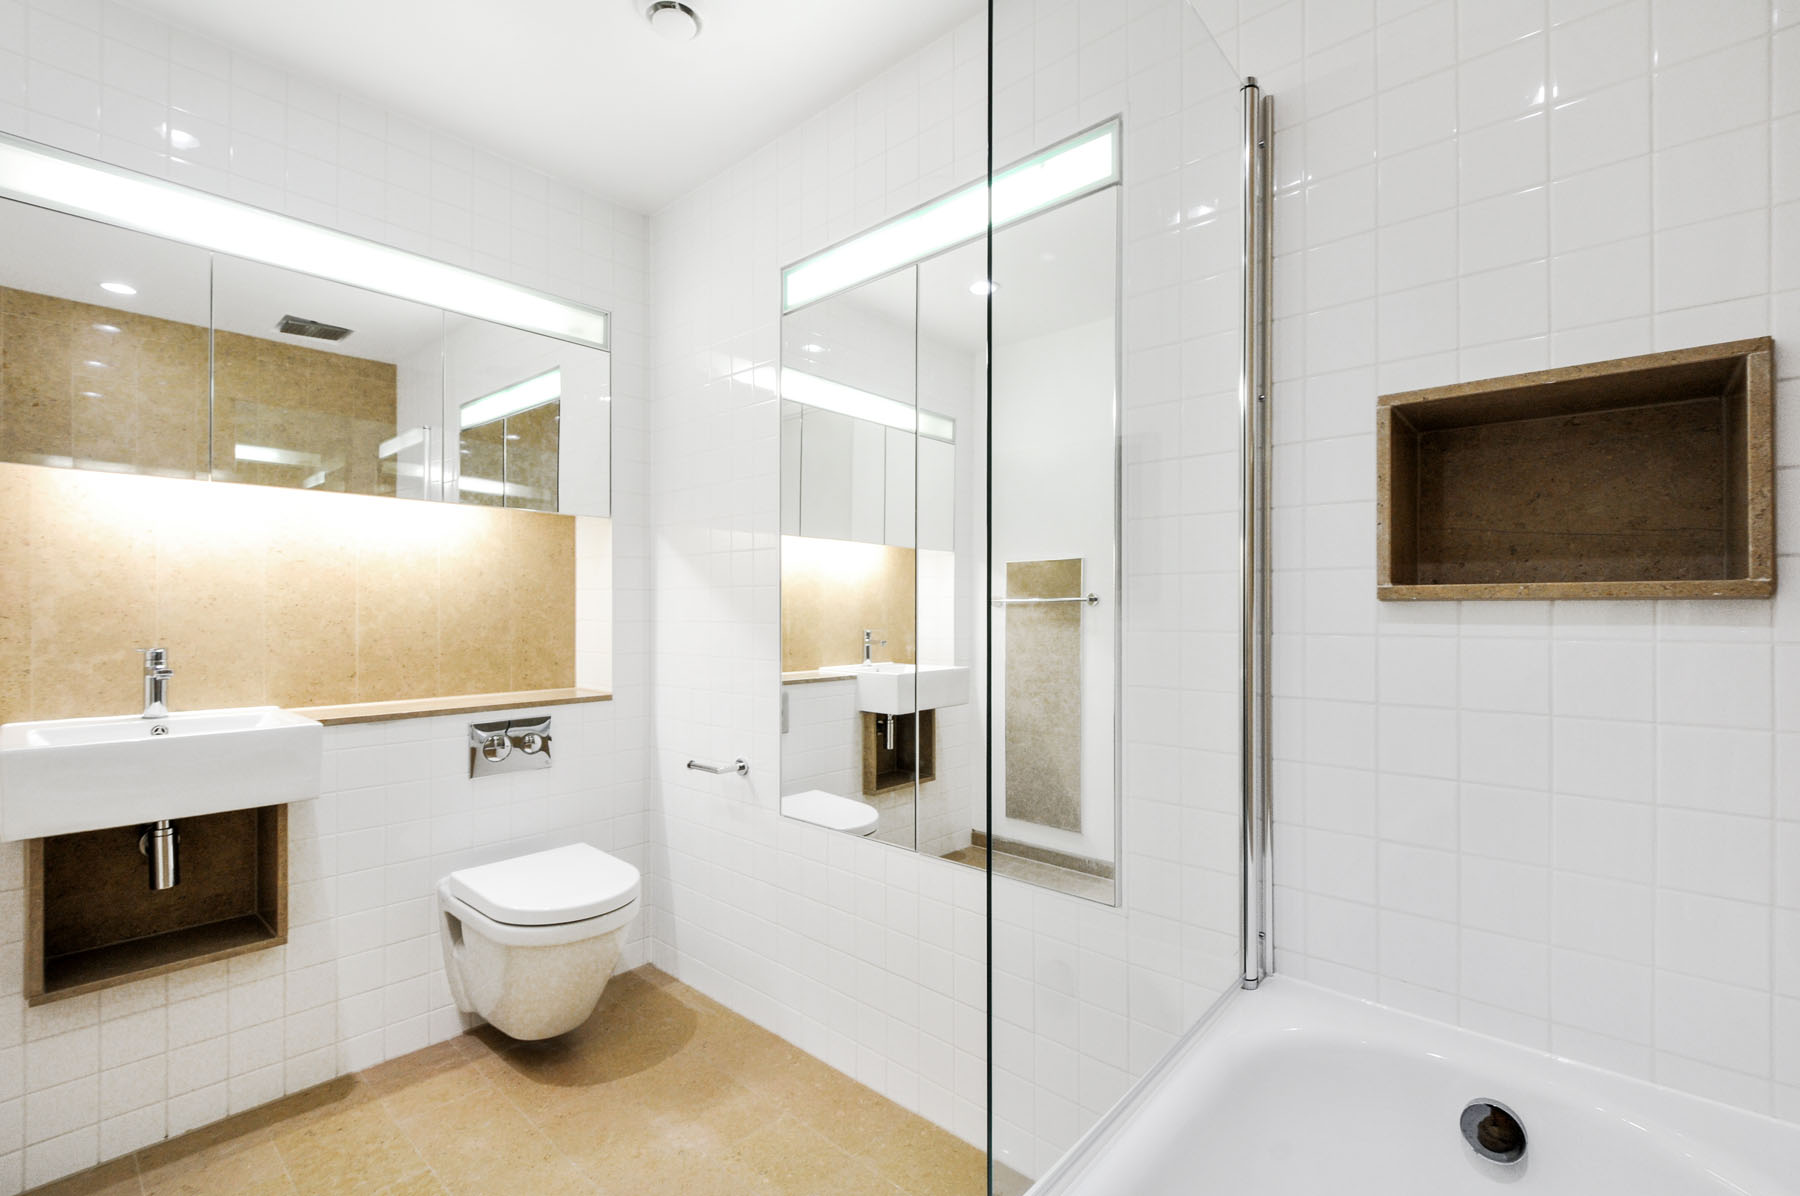 Warehaus,Bathroom